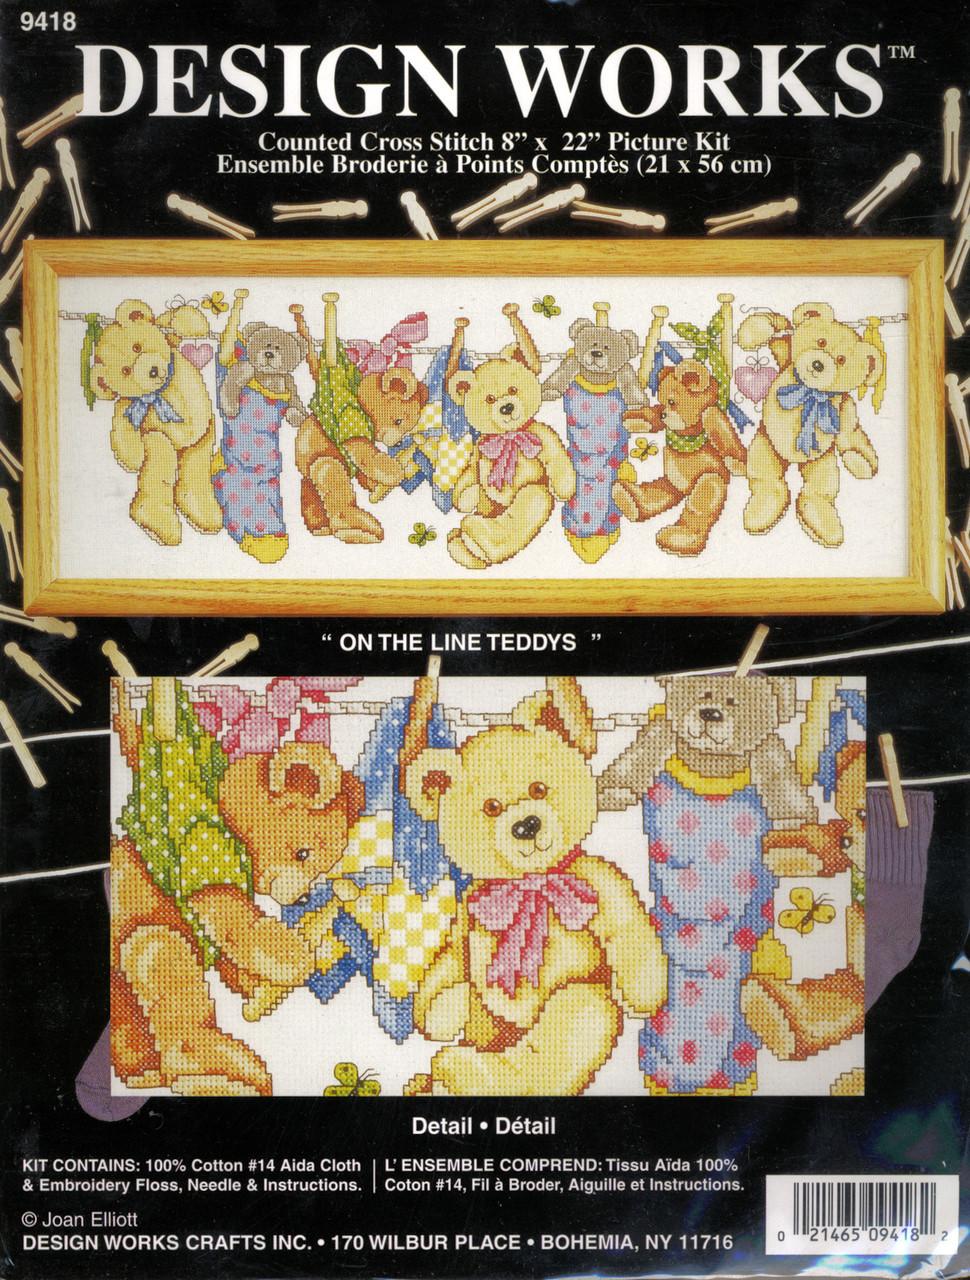 Design Works - On The Line Teddys